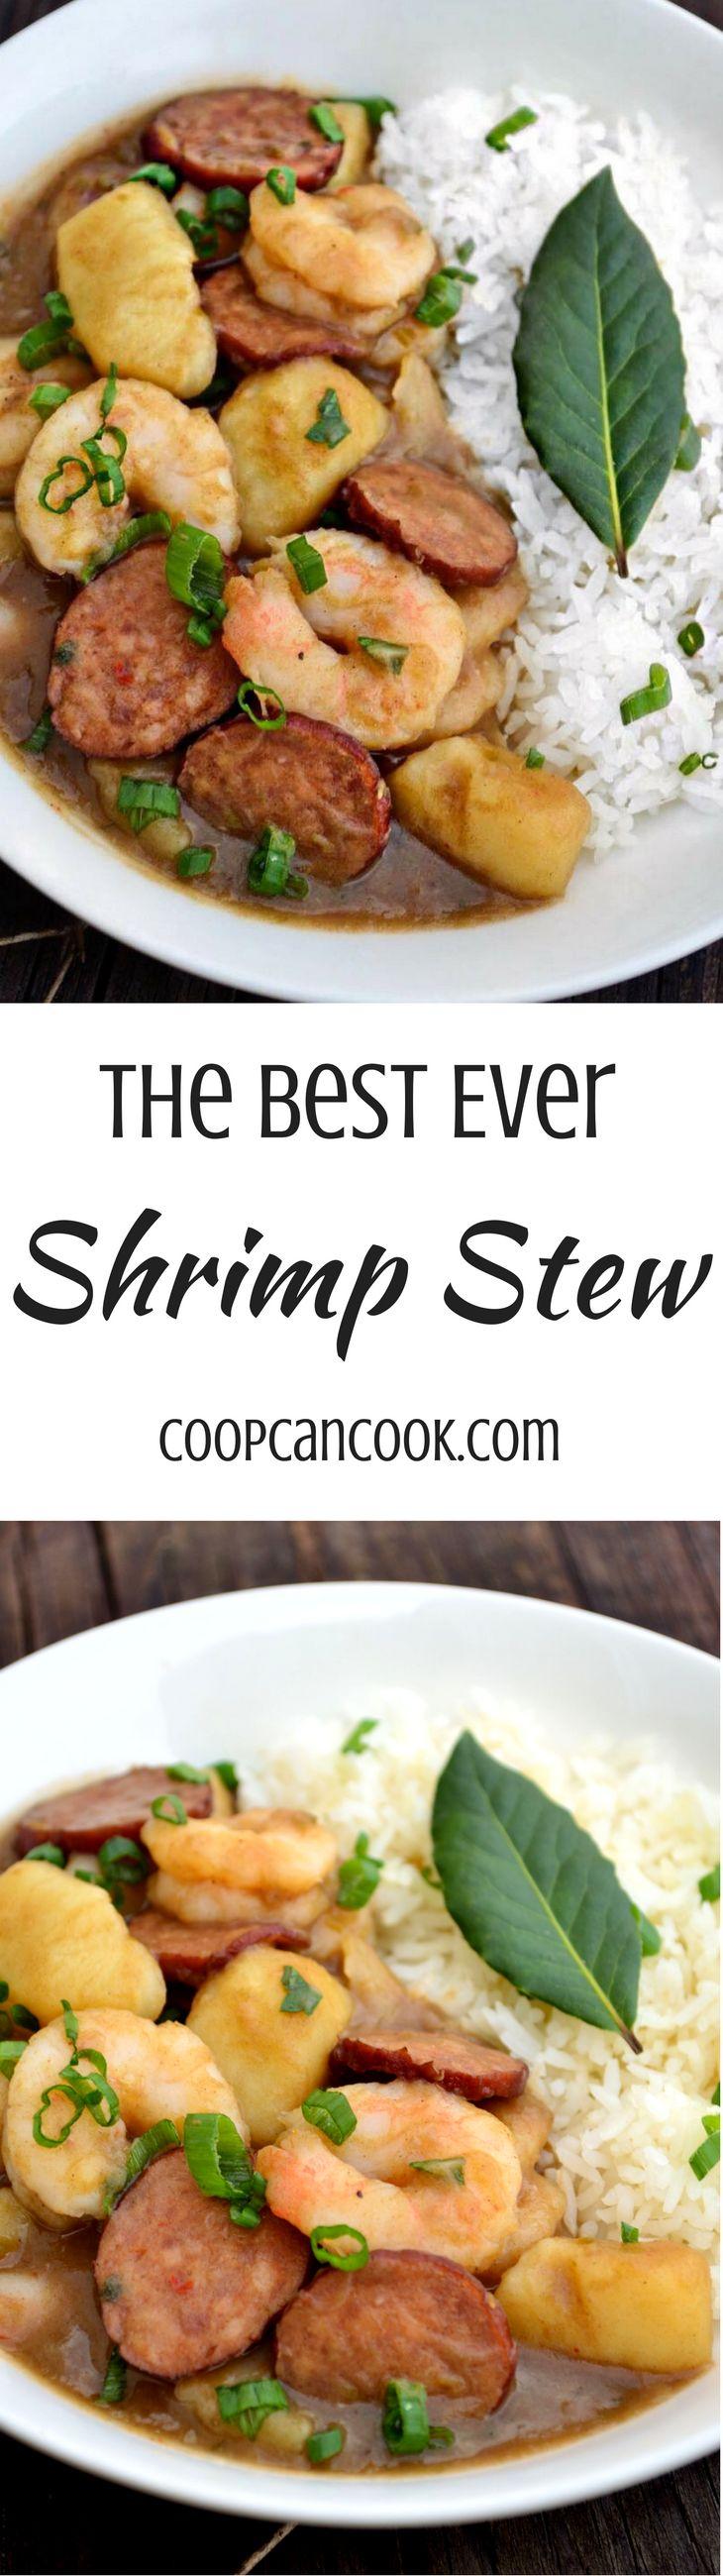 1142 best Cajun & Creole Cuisine images on Pinterest | Crawfish ...